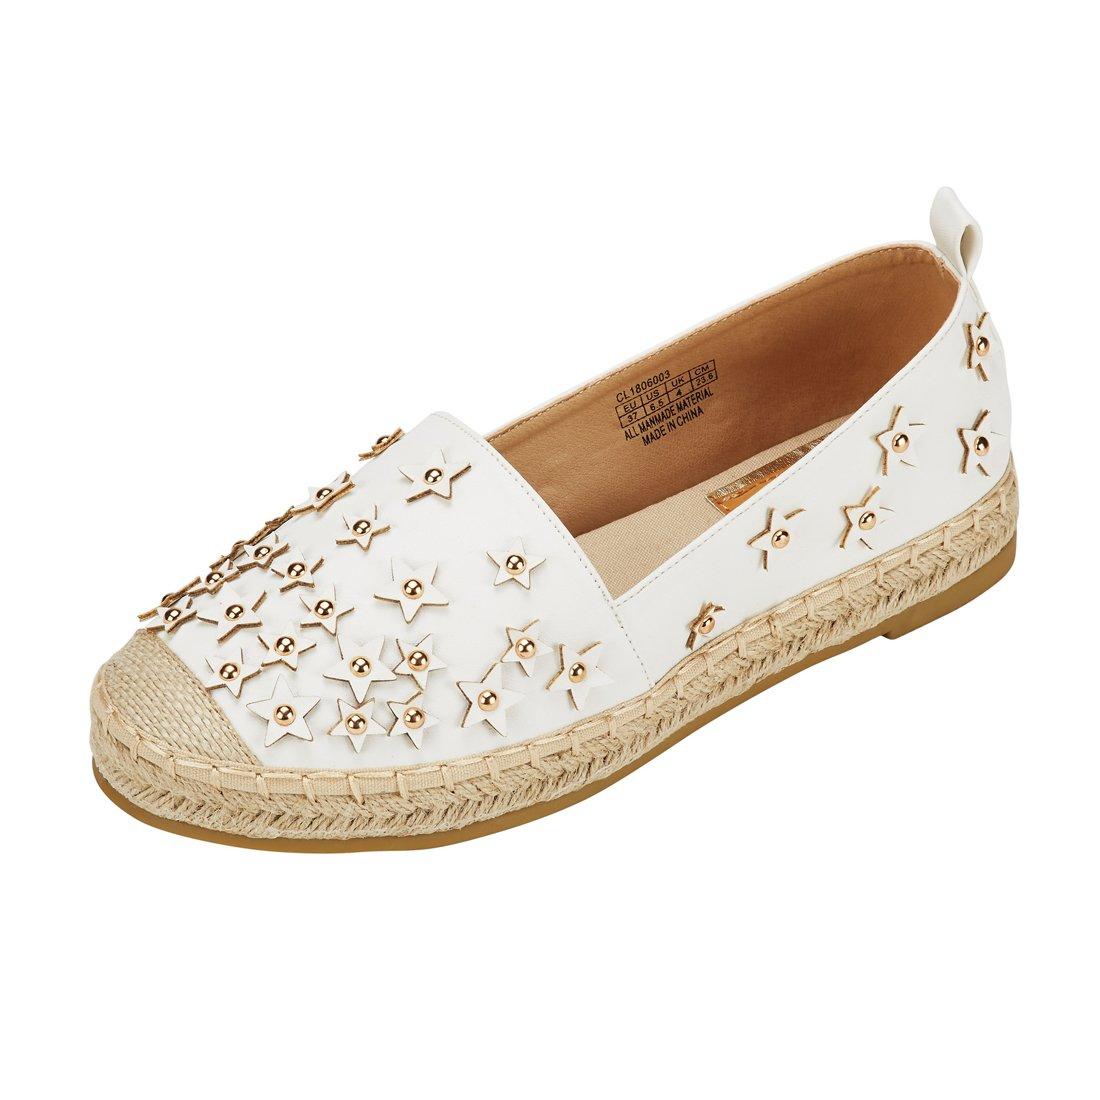 JENN ARDOR Women's Espadrilles Casual Flats Classic Slip-On Comfort Canvas Shoes with Glitter Bead,9 B(M) US (25.1CM),White Pu